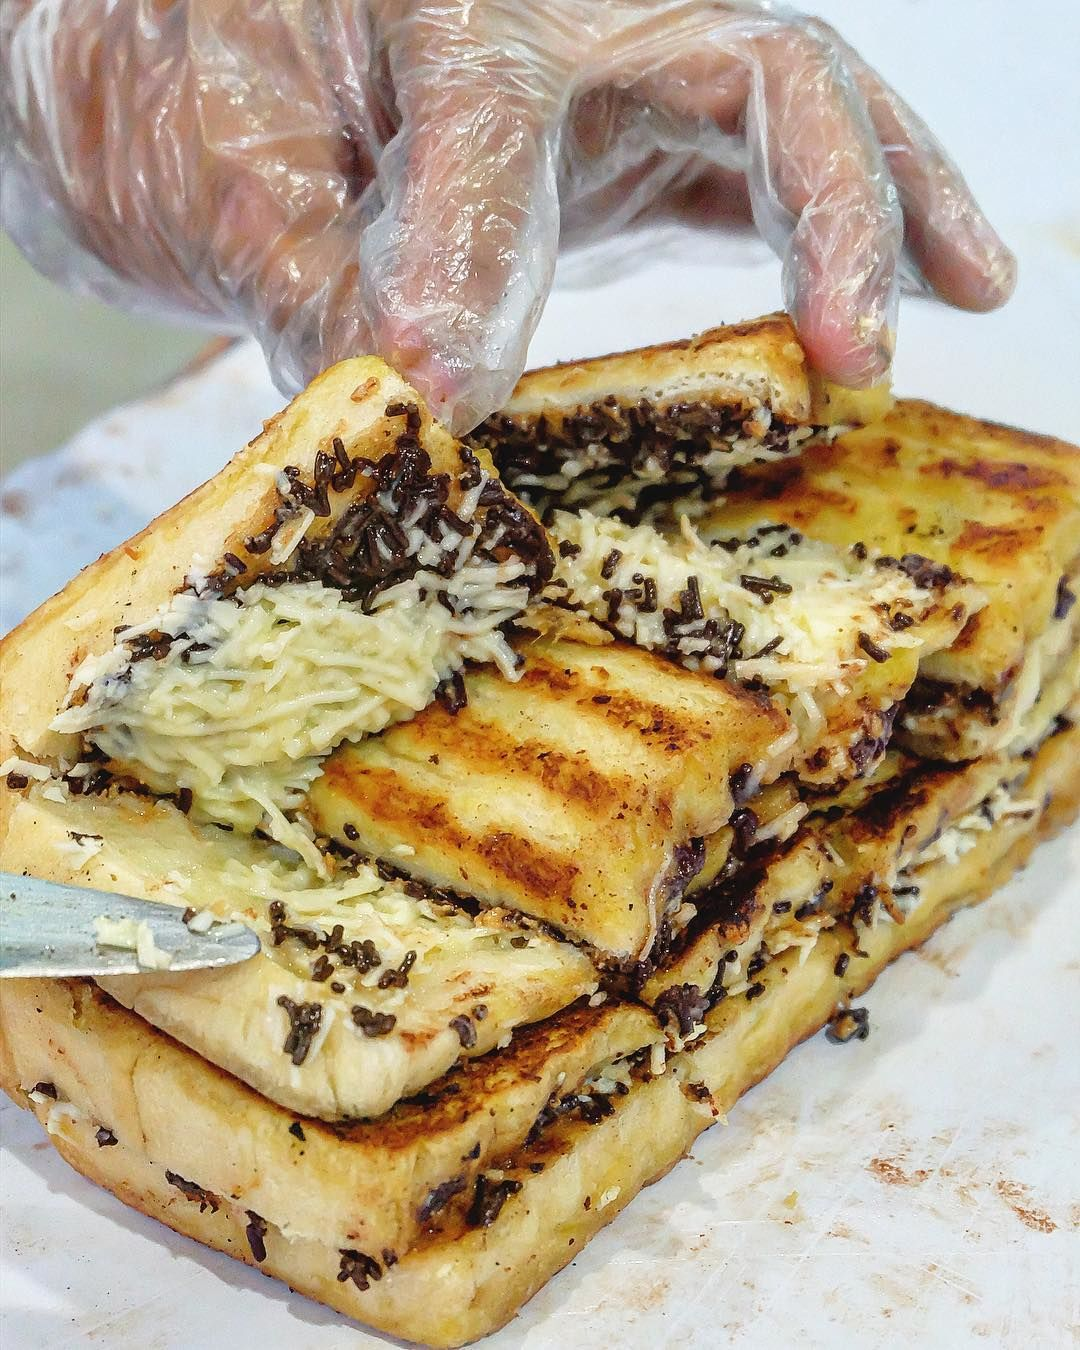 8 Wisata Kuliner Bandung yang Wajib Kamu Coba